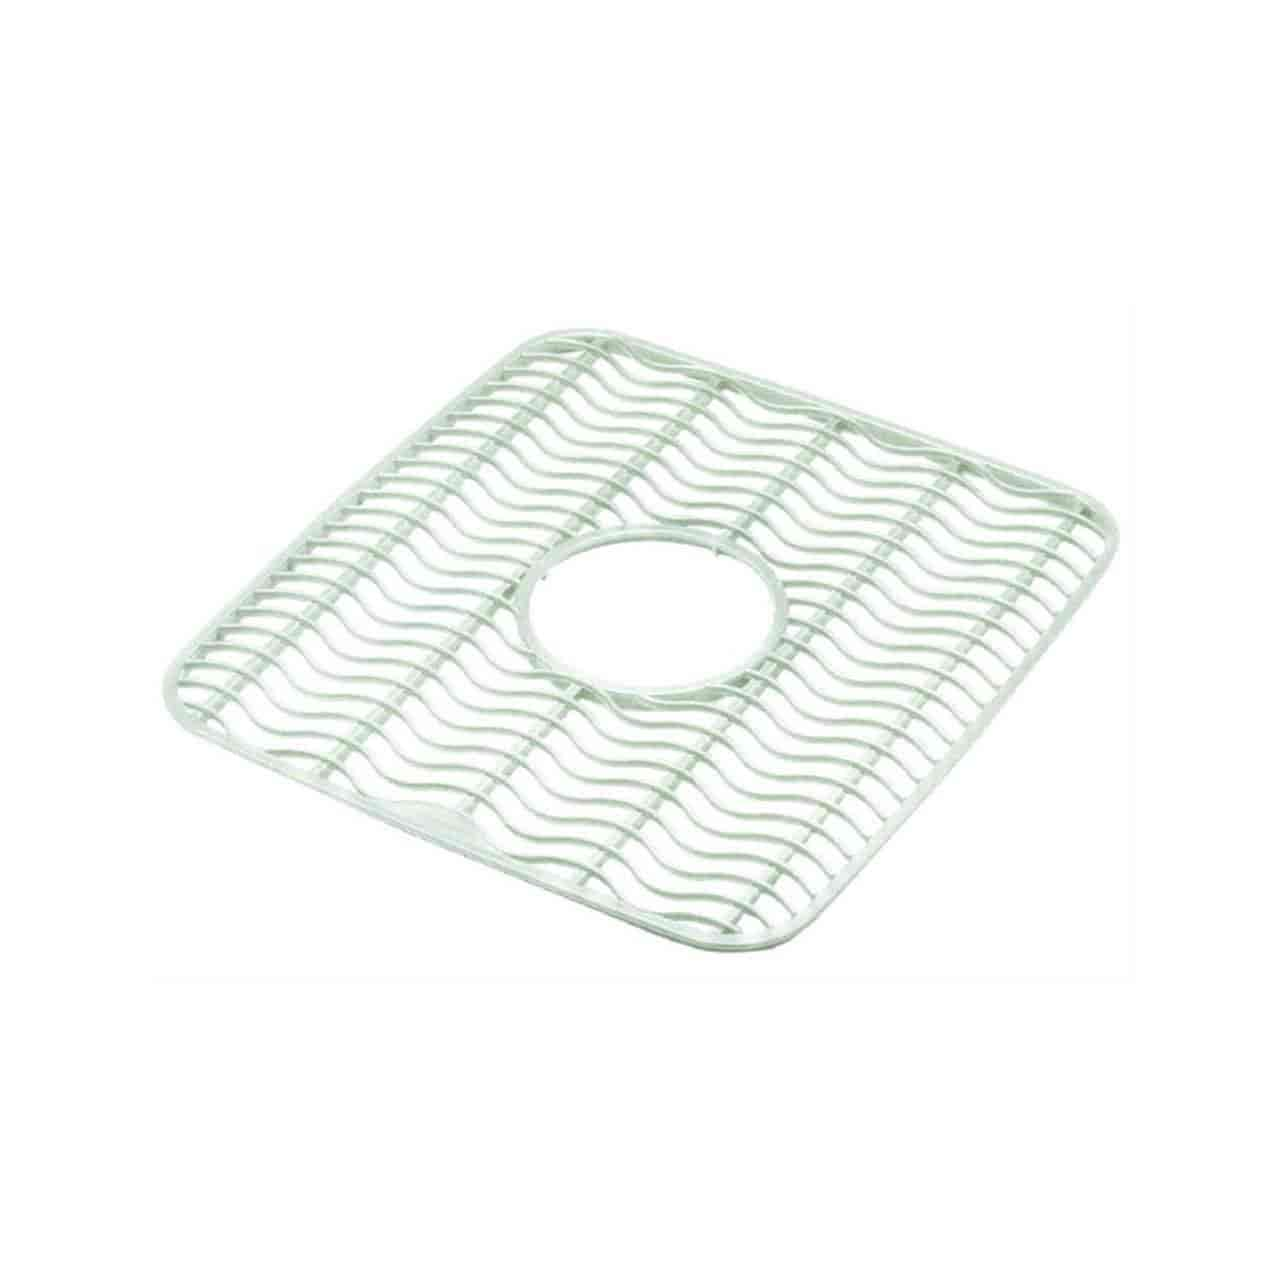 Rubbermaid sink mat white sinks ideas - Rubbermaid kitchen sink divider mats ...